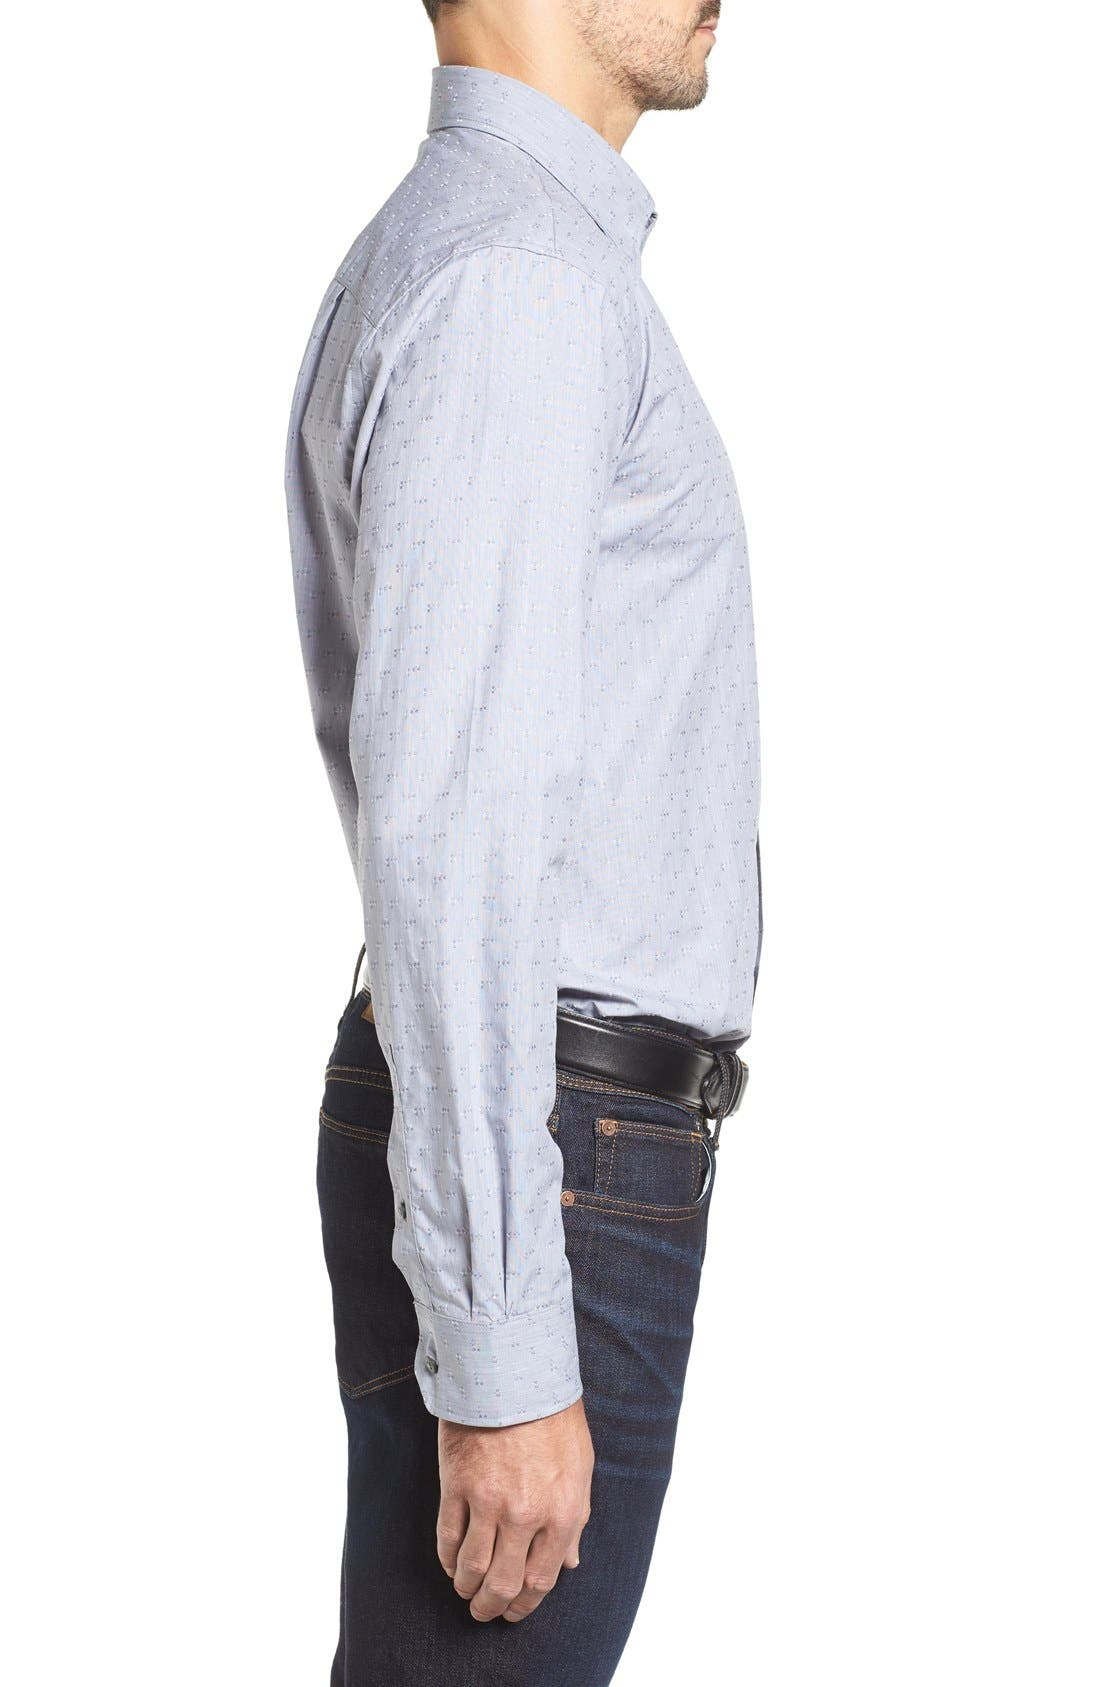 Starboard Jacquard Sport Shirt,                             Alternate thumbnail 4, color,                             Grey/ Multi